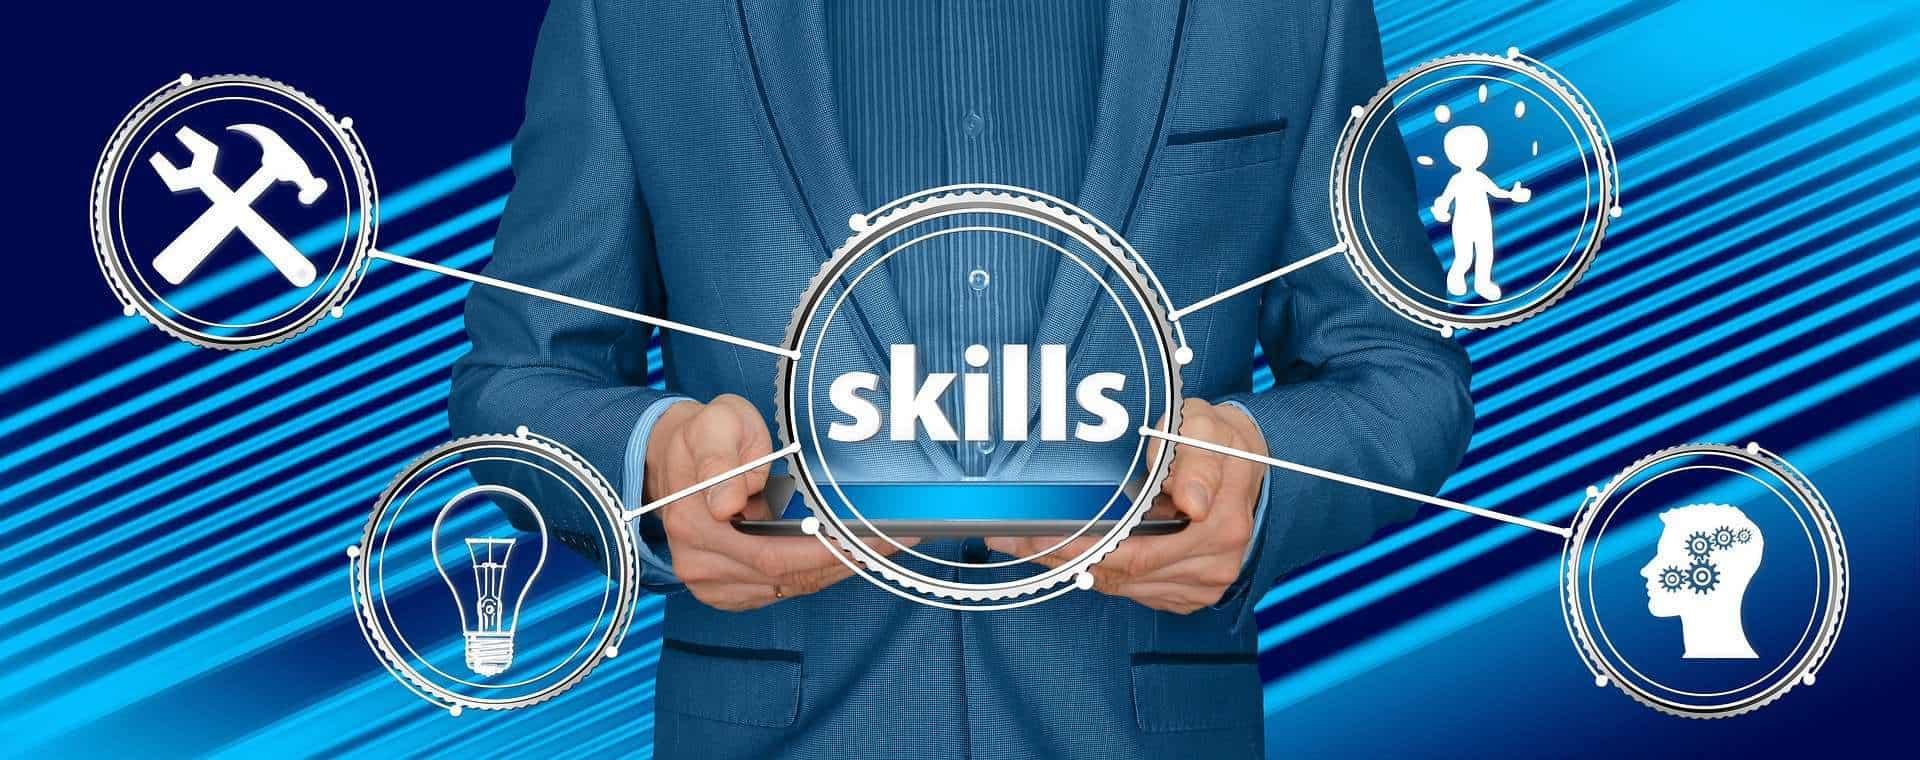 ways 2 leads - marketing-agentur - skills and goals